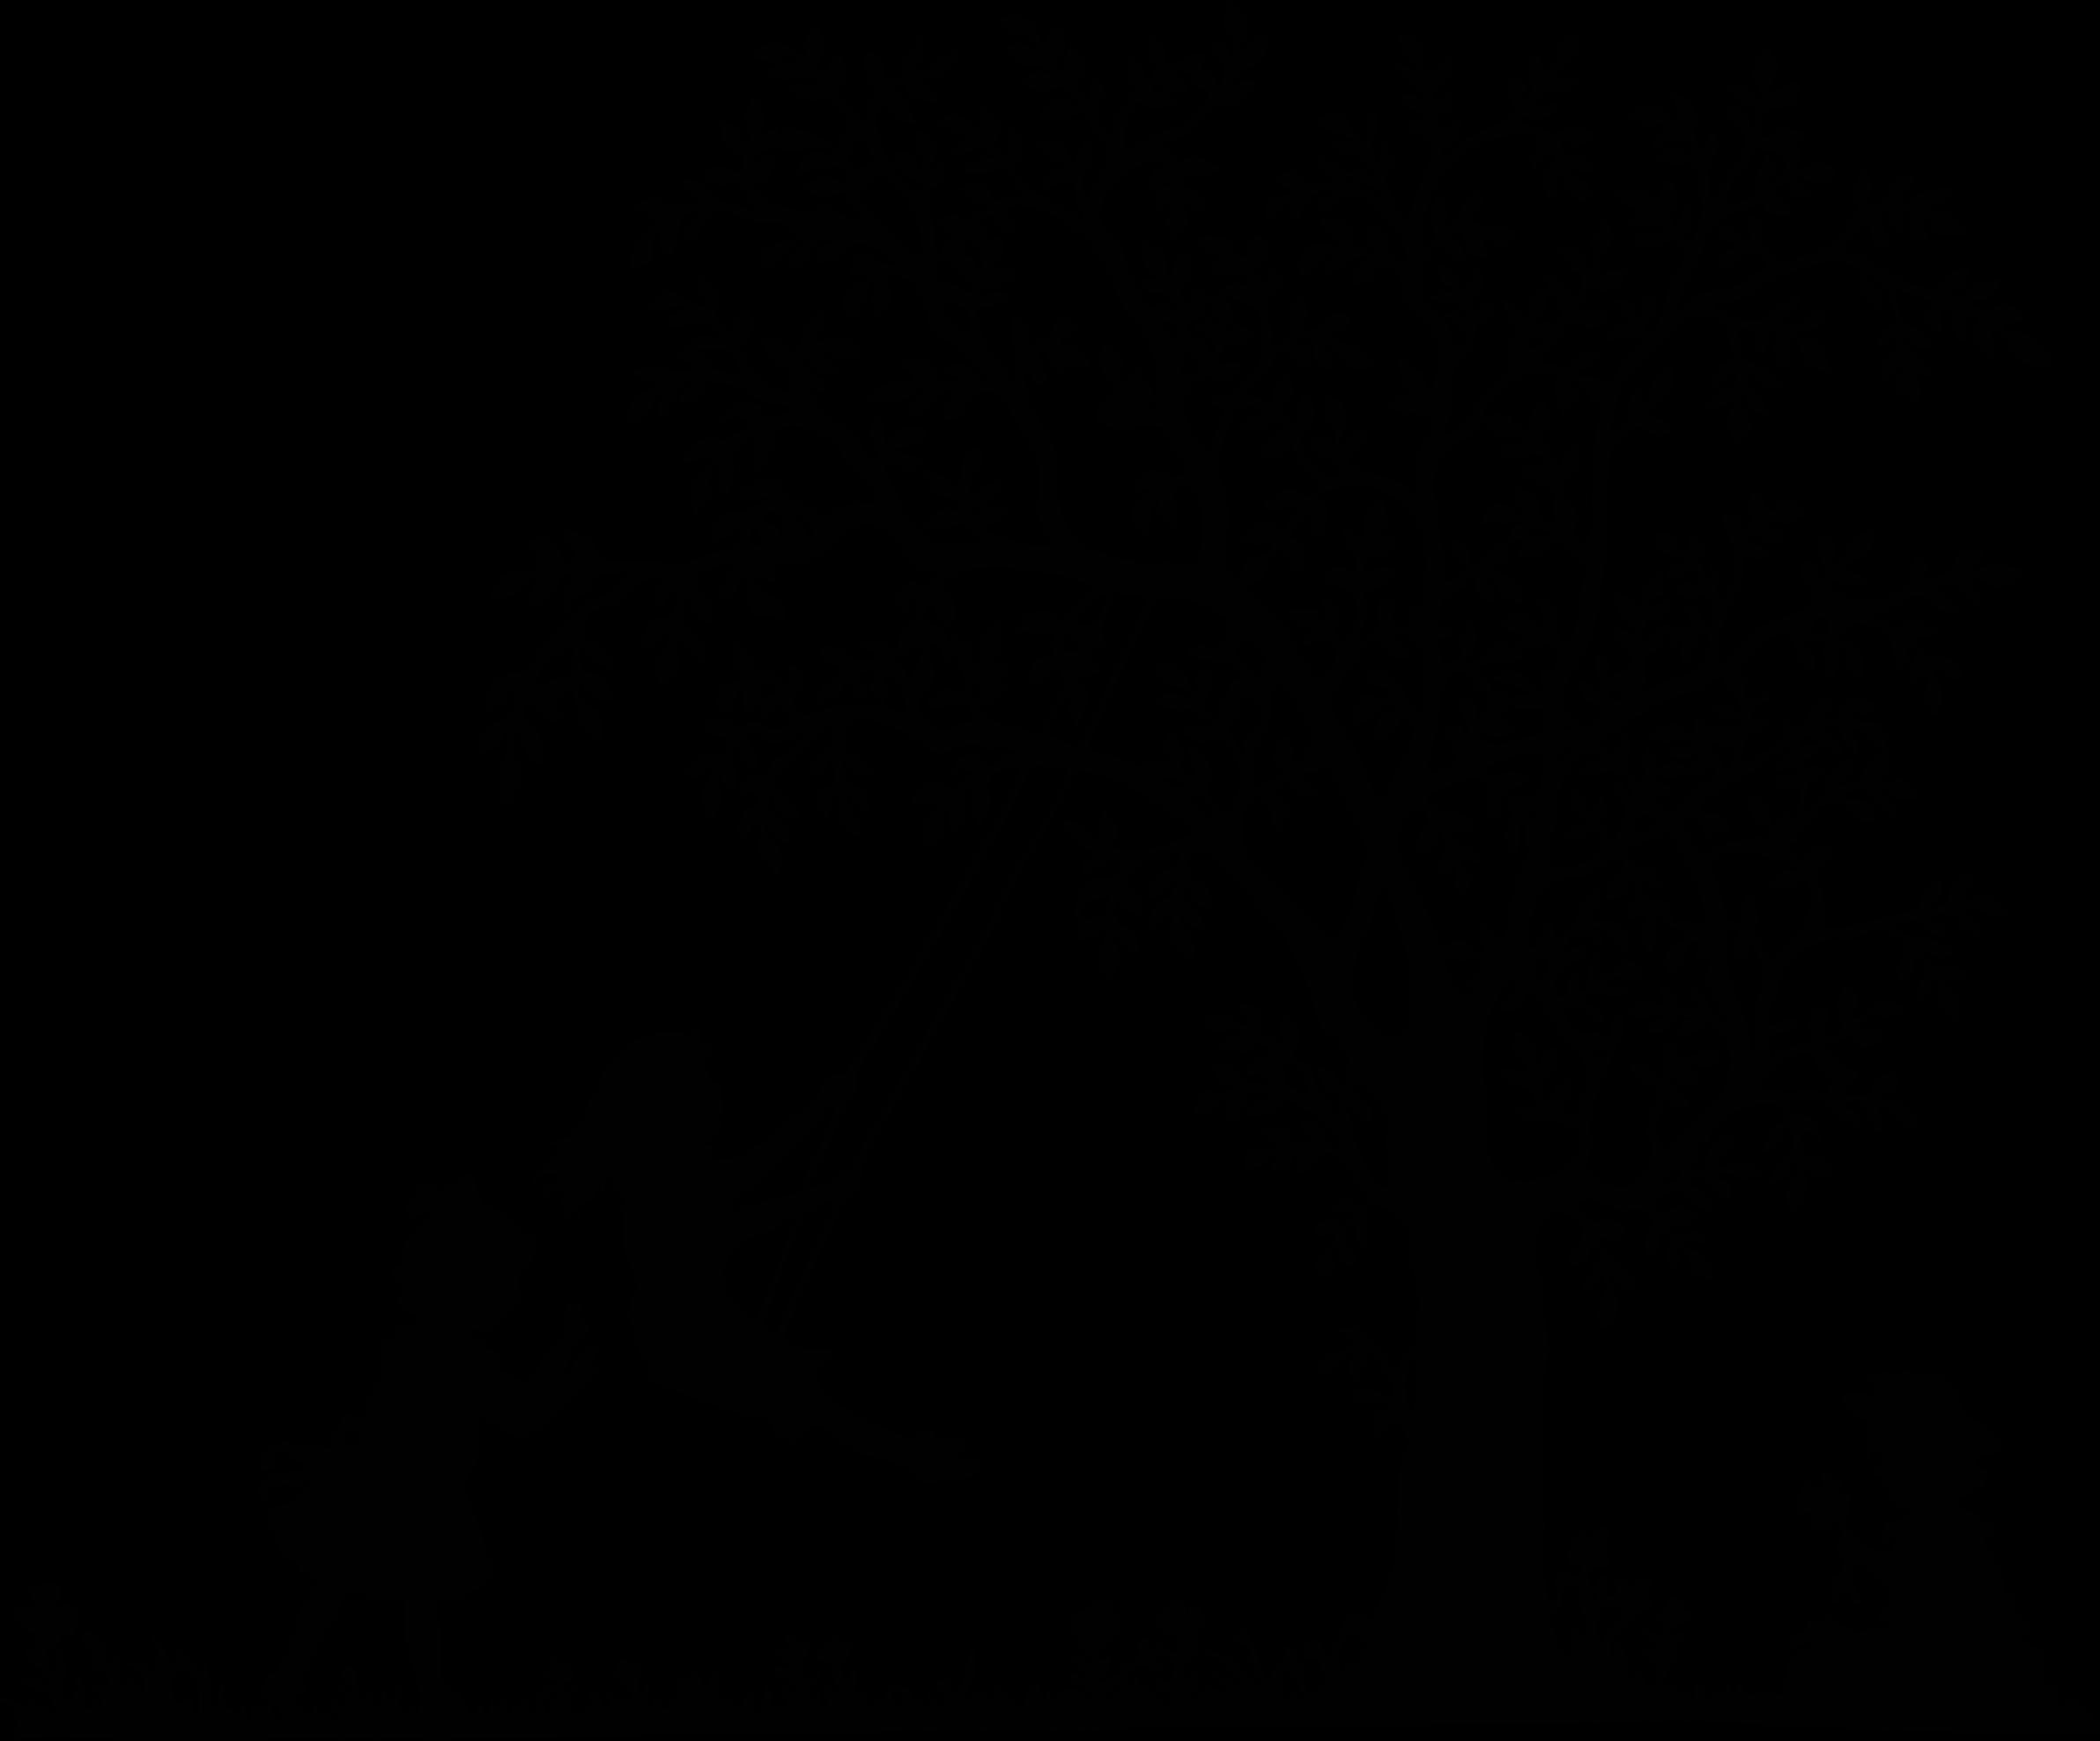 2384x1976 Clipart